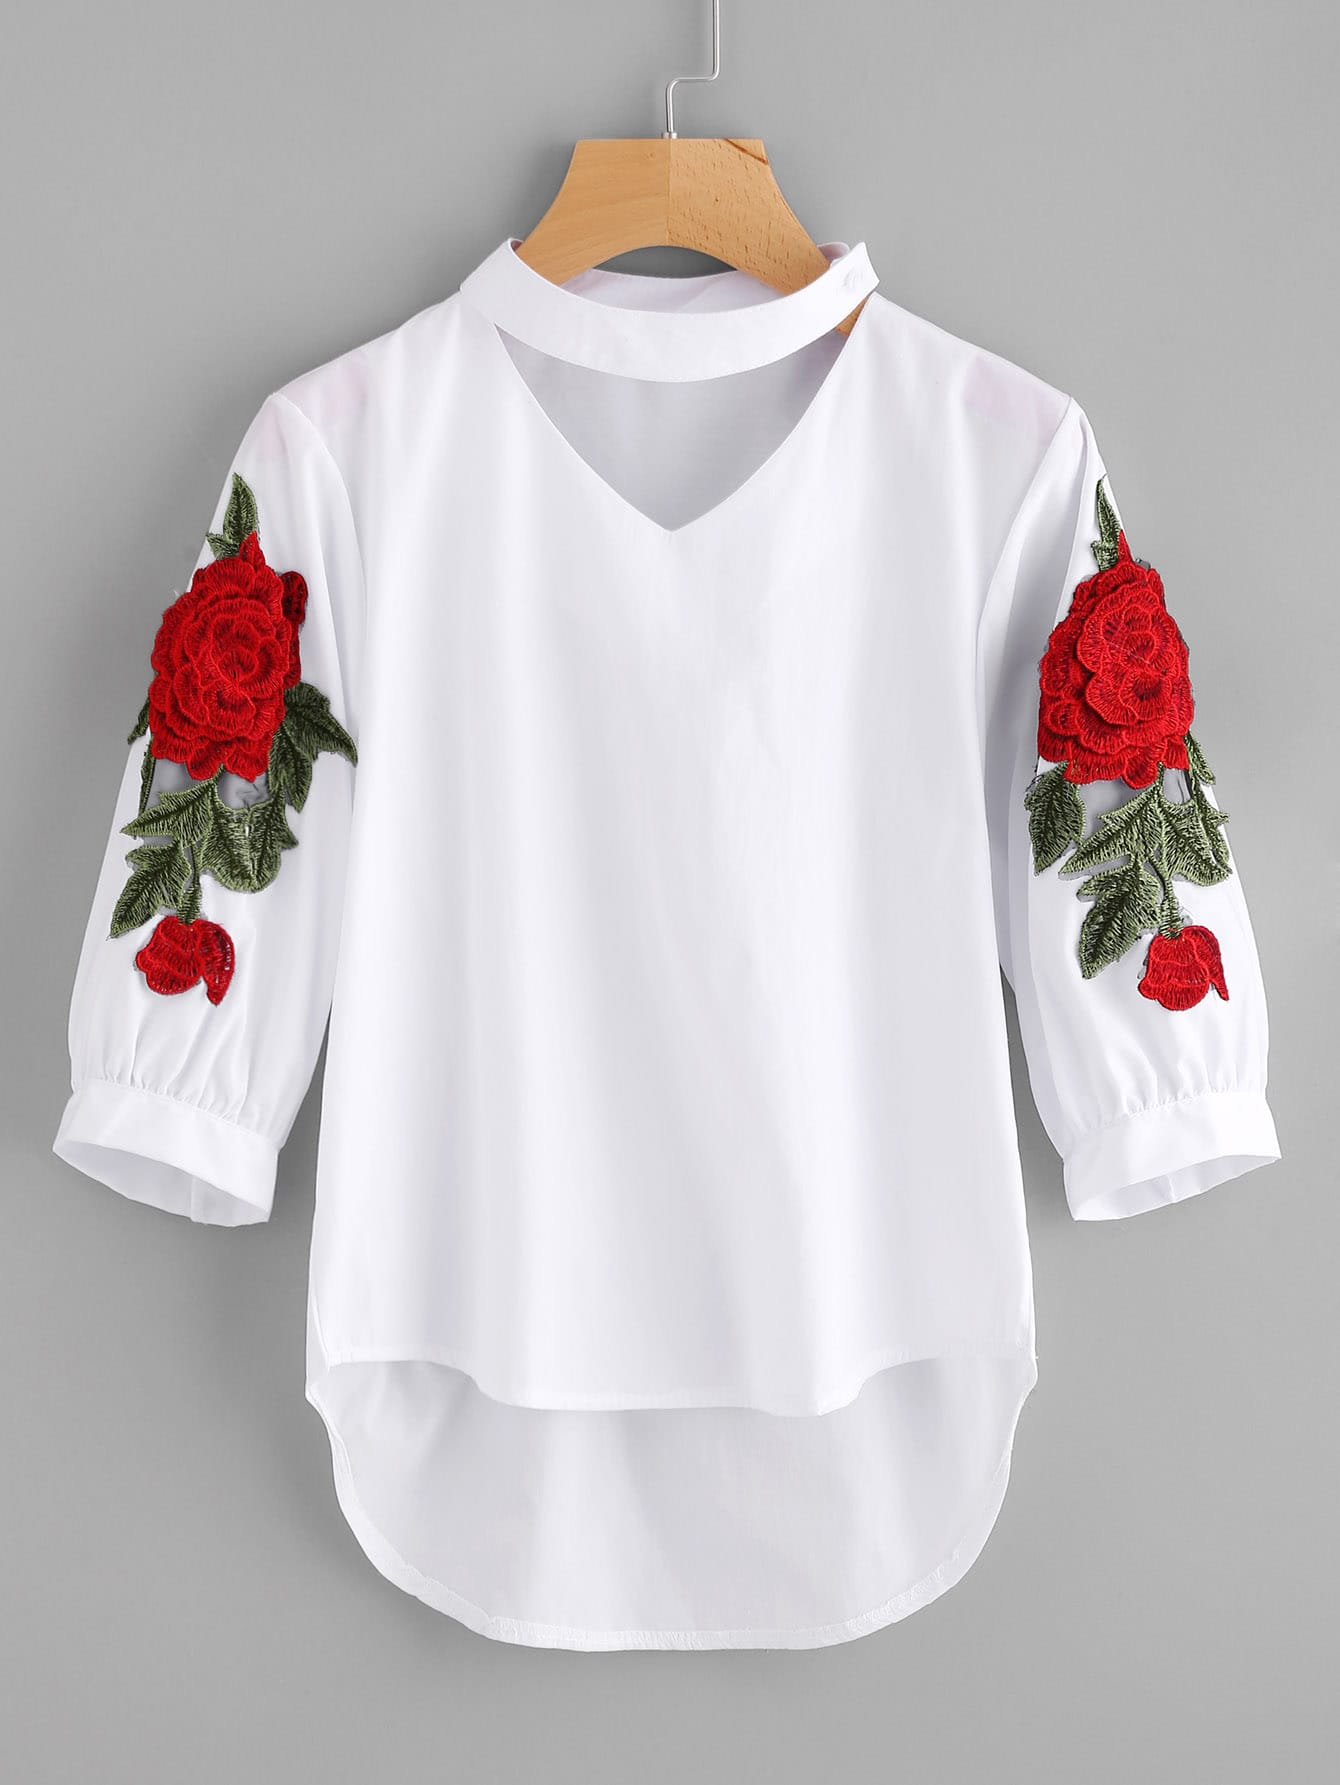 Embroidered Appliques Choker Neck Dip Hem Blouse plus size cartoon embroidered arc hem blouse